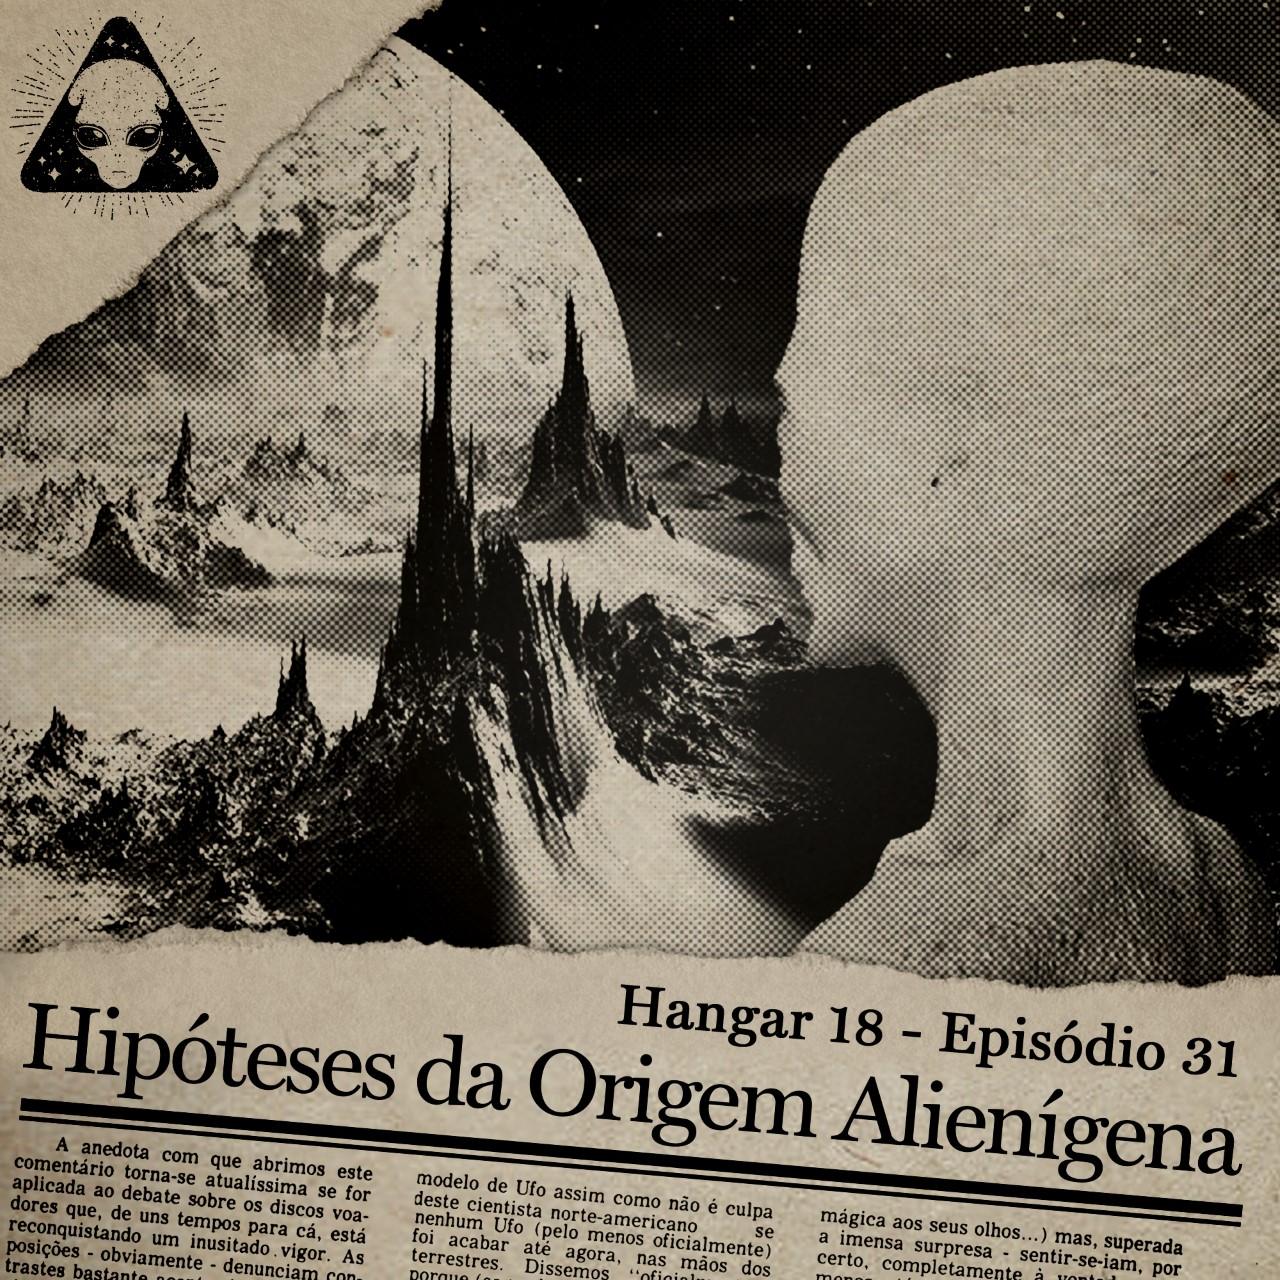 E31 Hangar 18 - Ep 031 - Hipóteses da Origem Alienígena